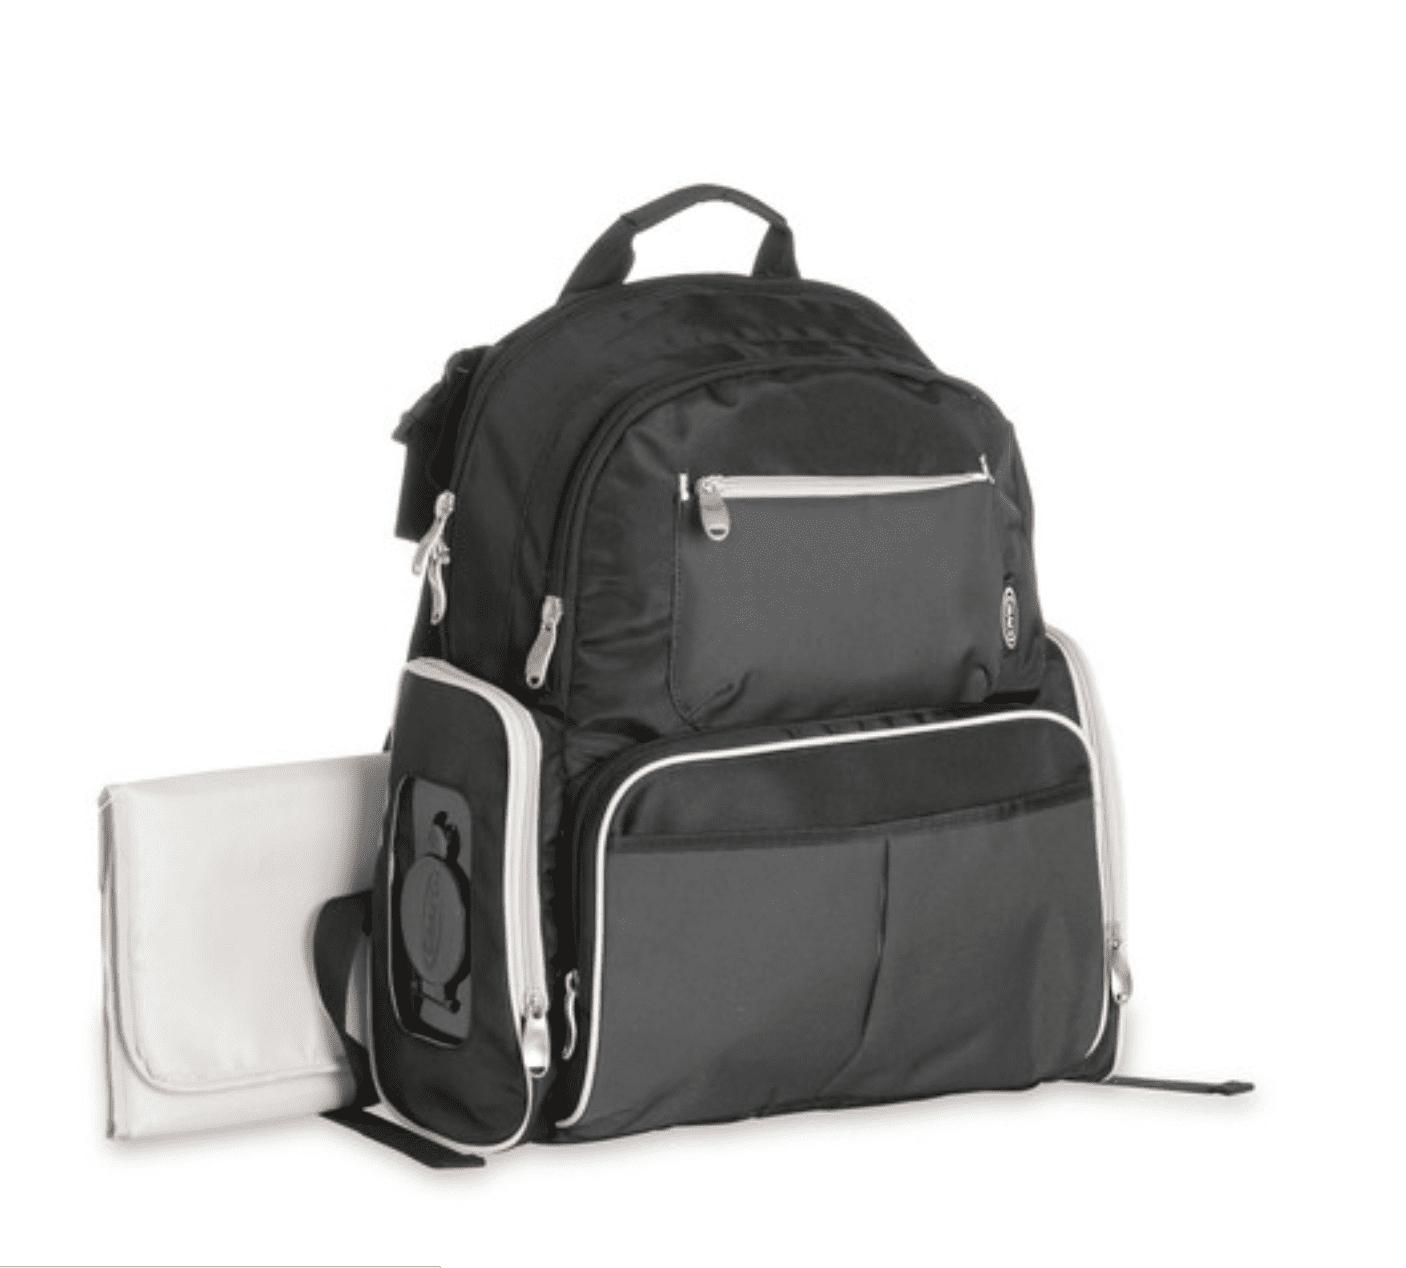 803fd602ec6 Best for Twins  Graco Gotham Backpack Diaper Bag